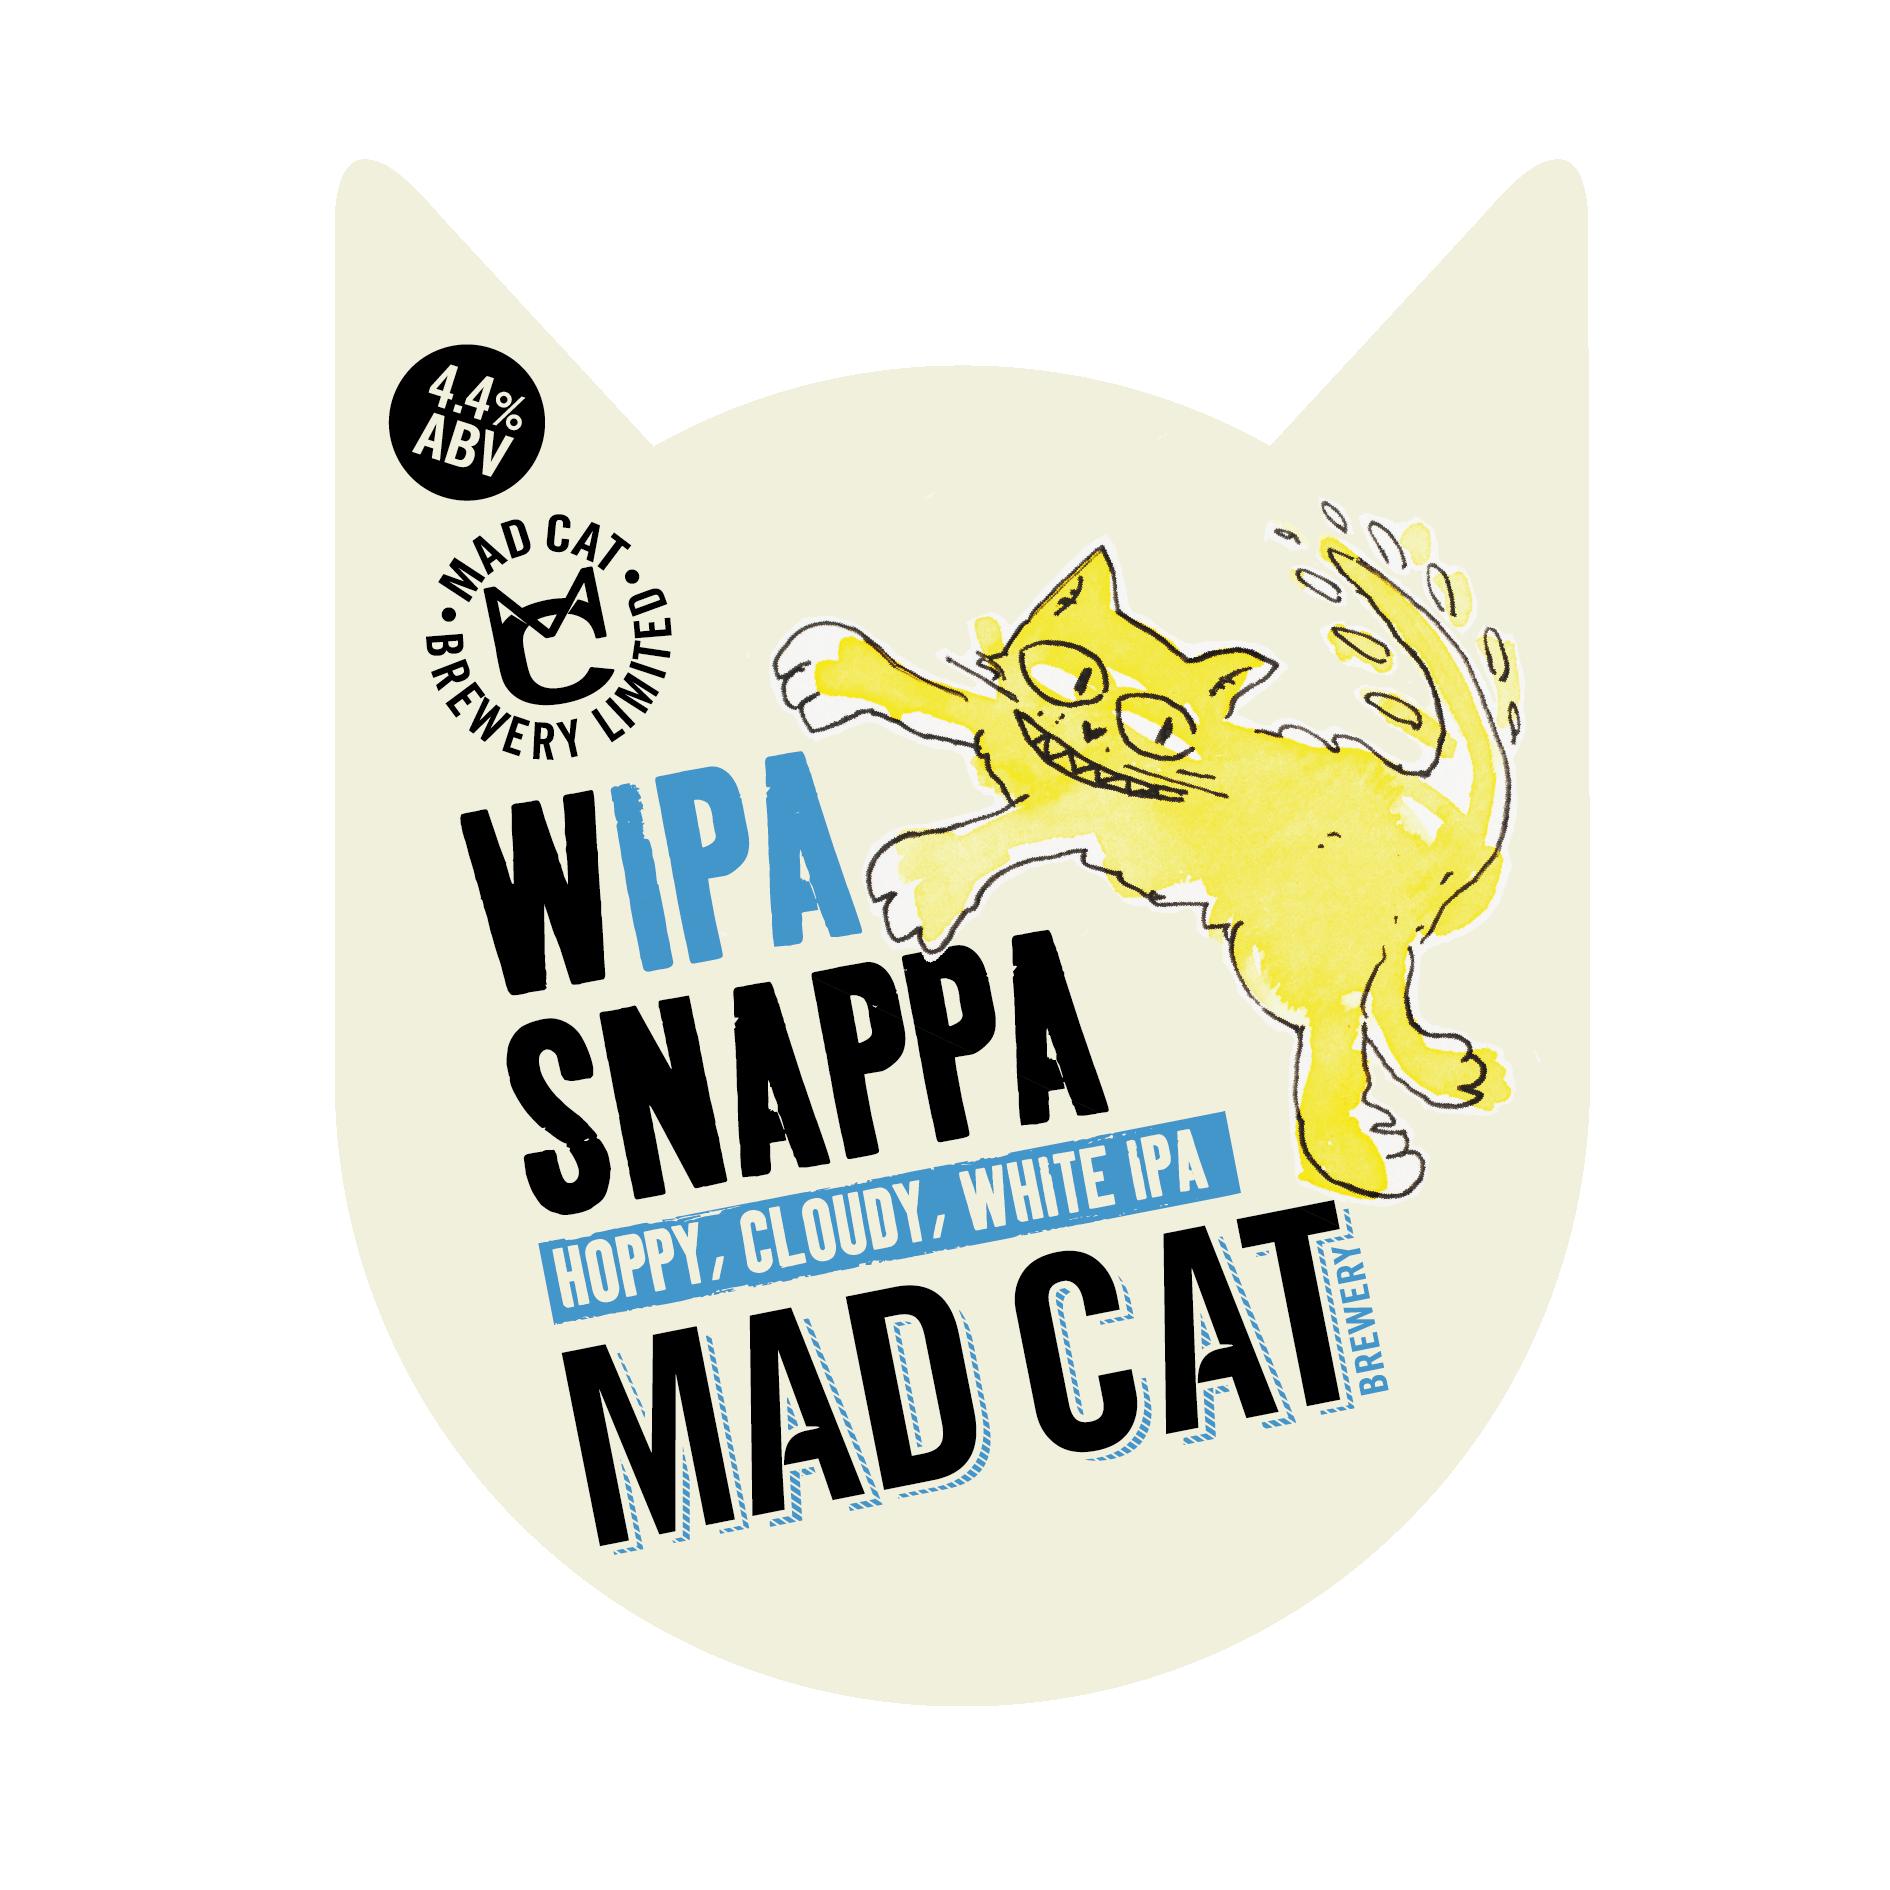 Wipa Snappa